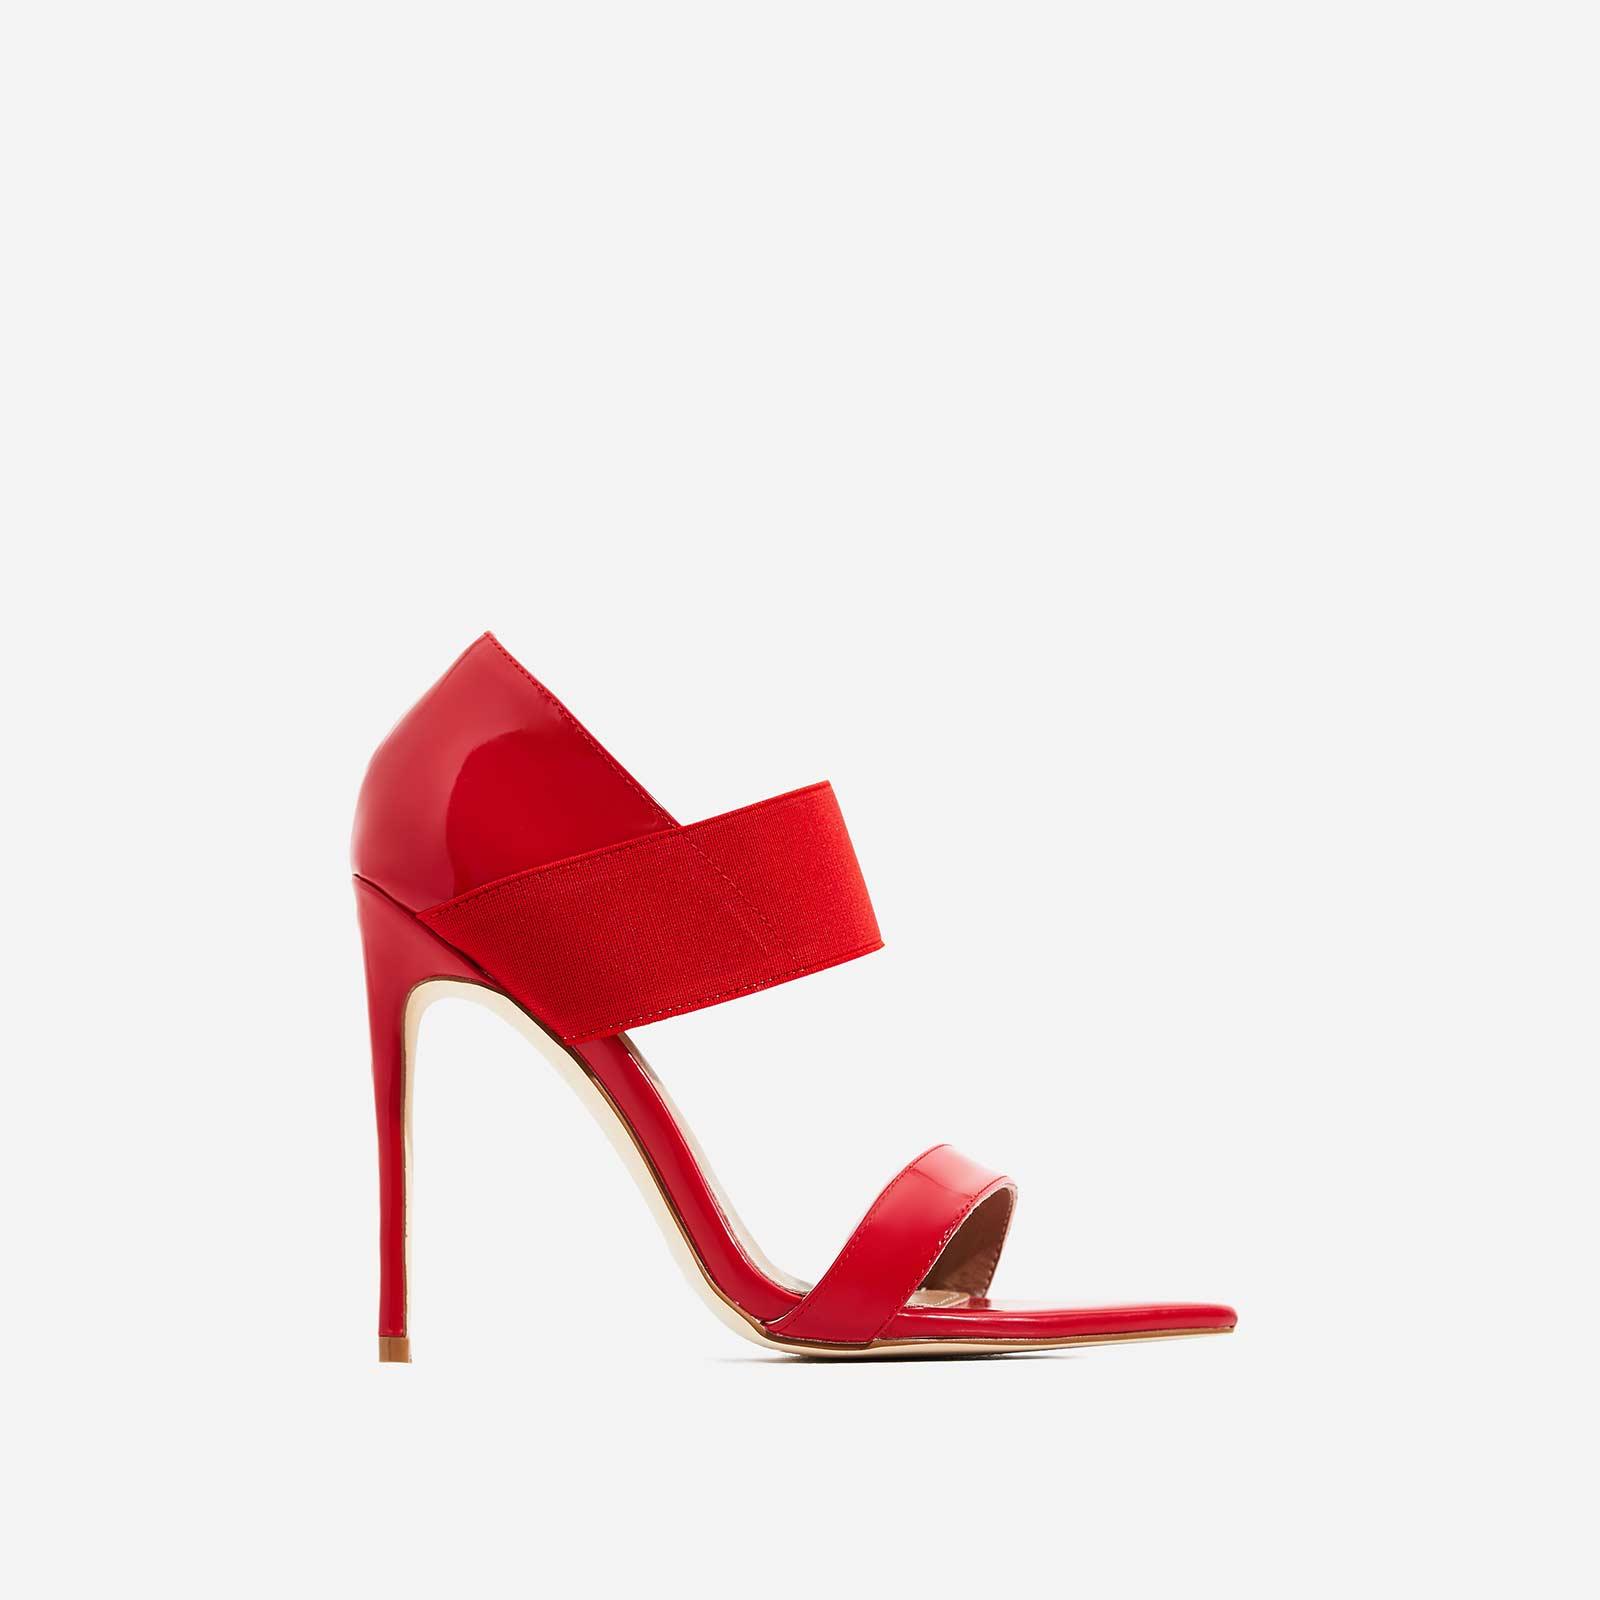 Erika Elasticated Pointed Peep Toe Heel In Red Patent